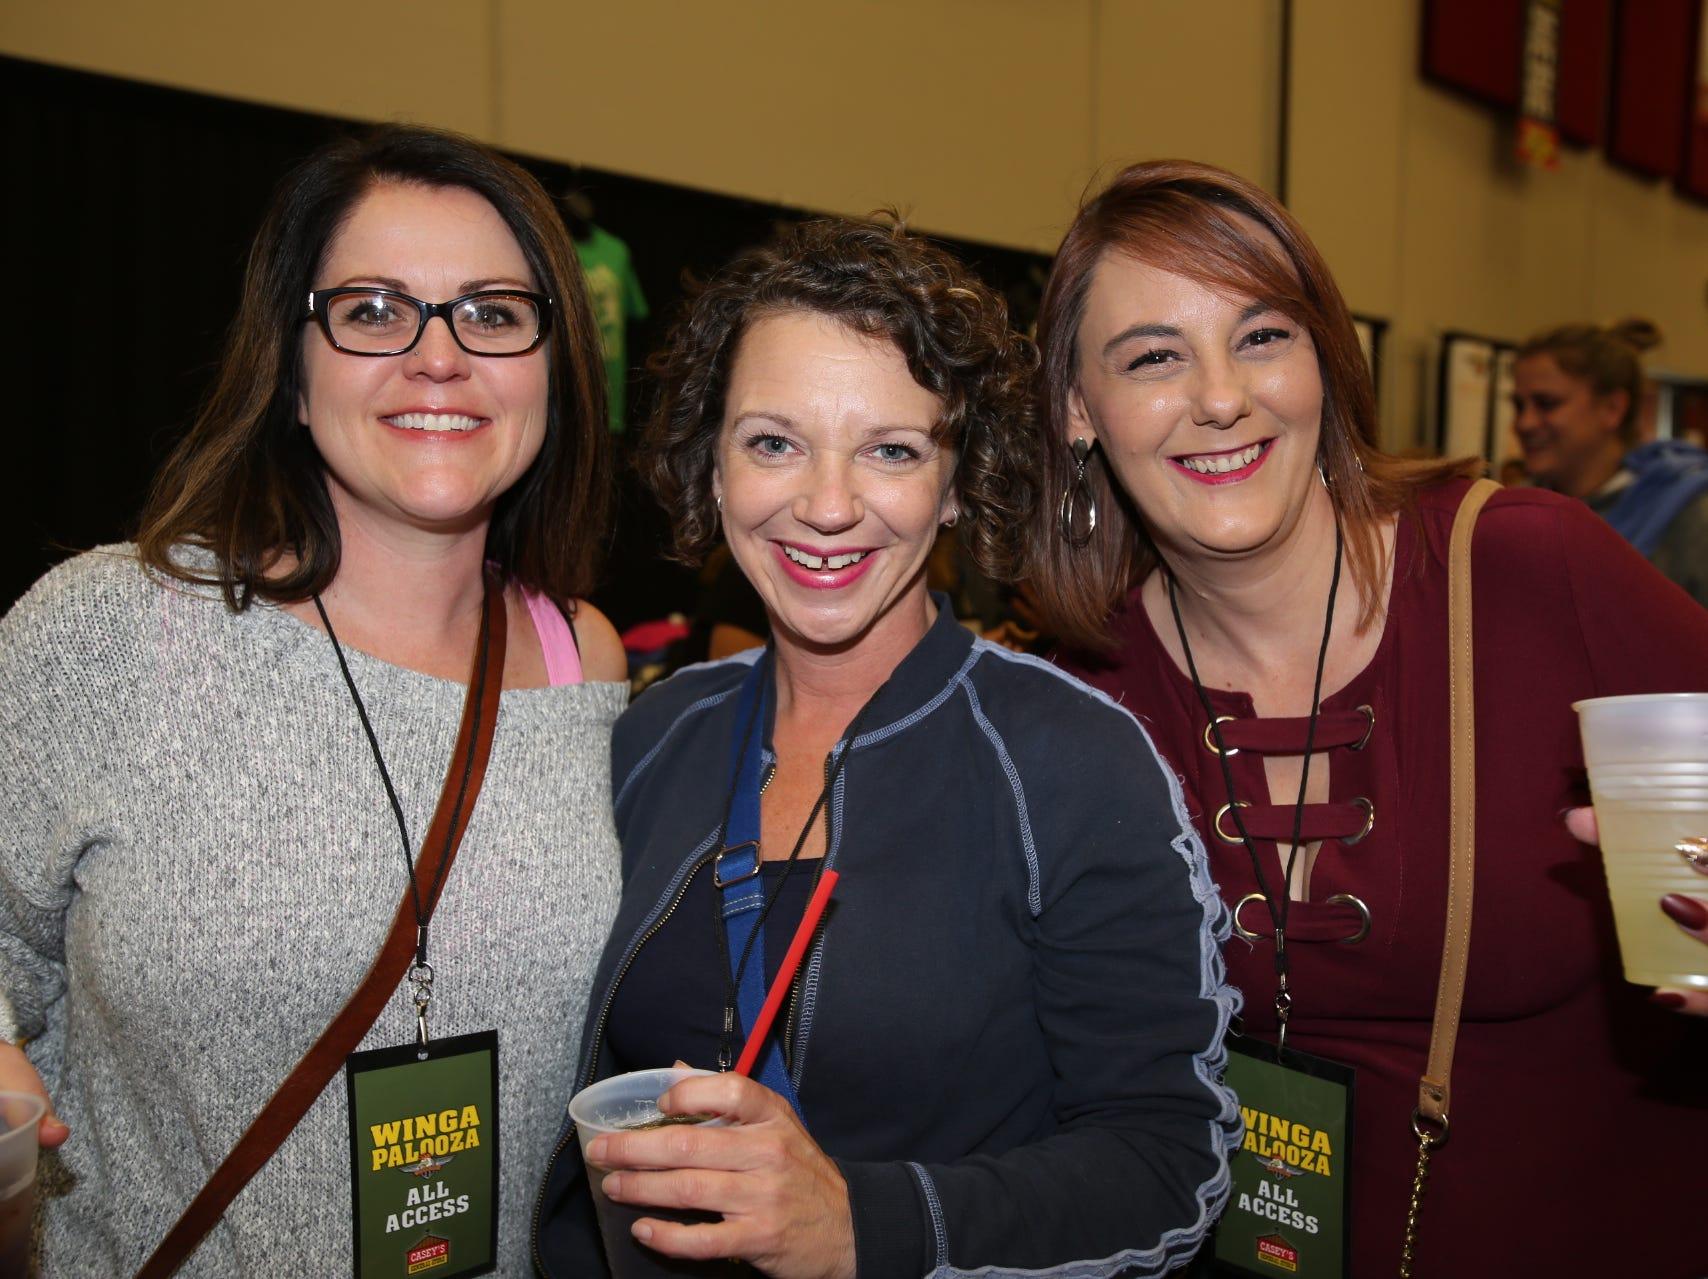 Jessica Livingston, Jamie Jamison, and Bess Kauflin